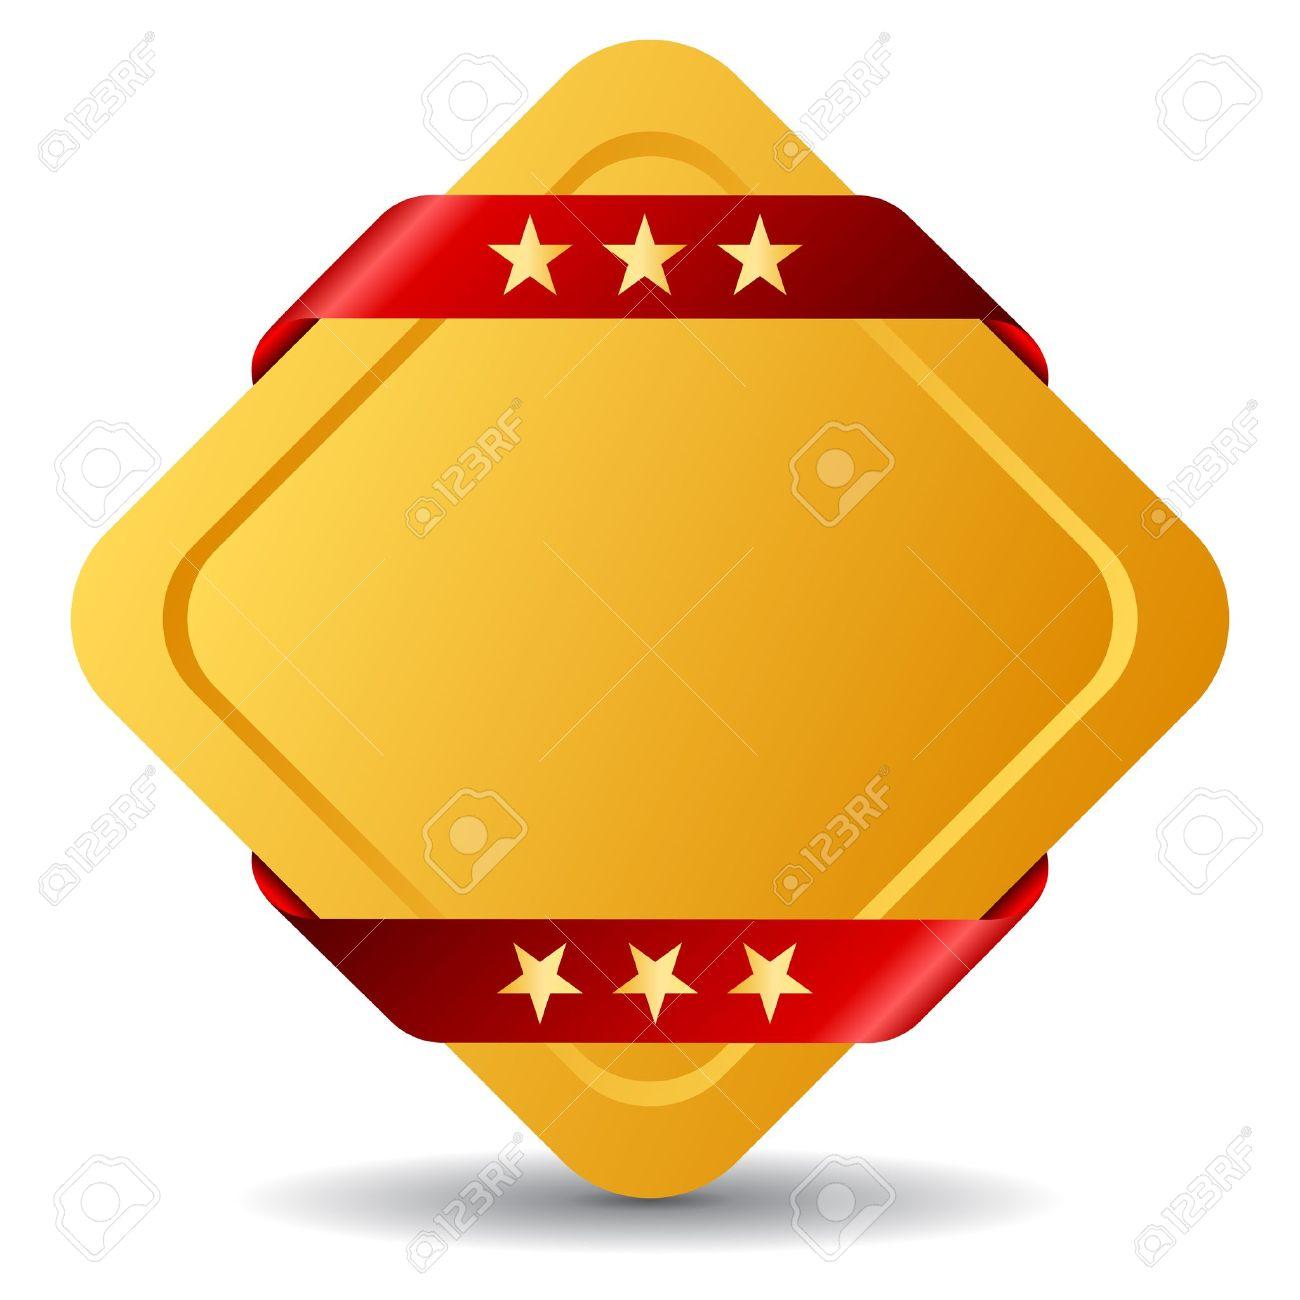 Rhombus blank award symbol illustration Stock Vector - 13310774